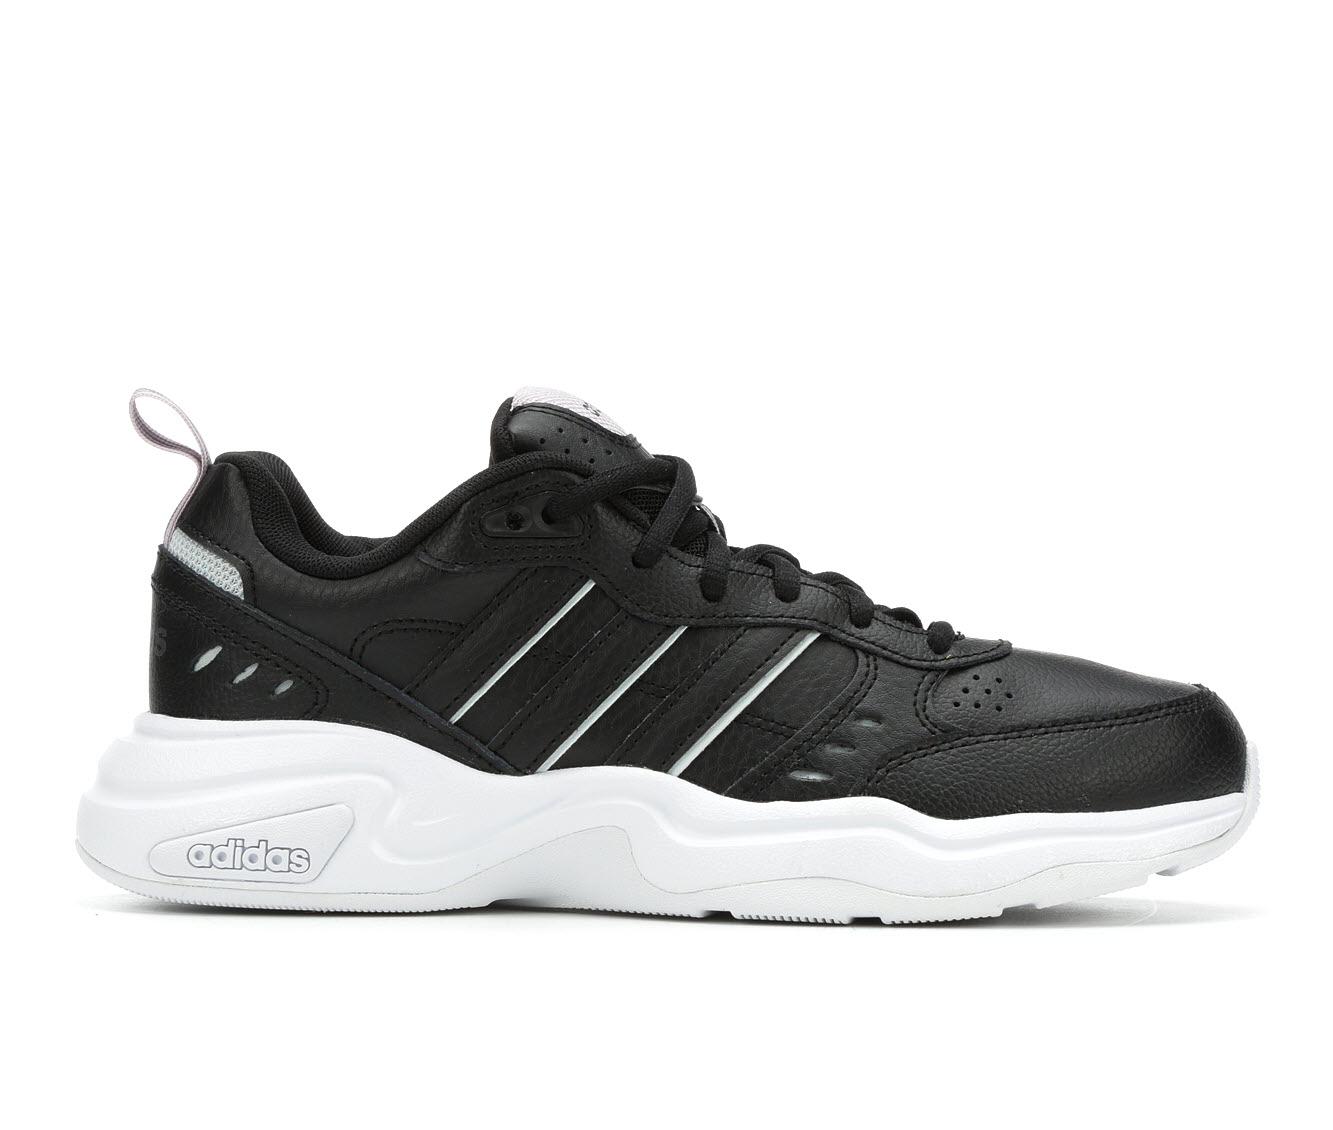 Adidas Strutter Women's Athletic Shoe (Black)